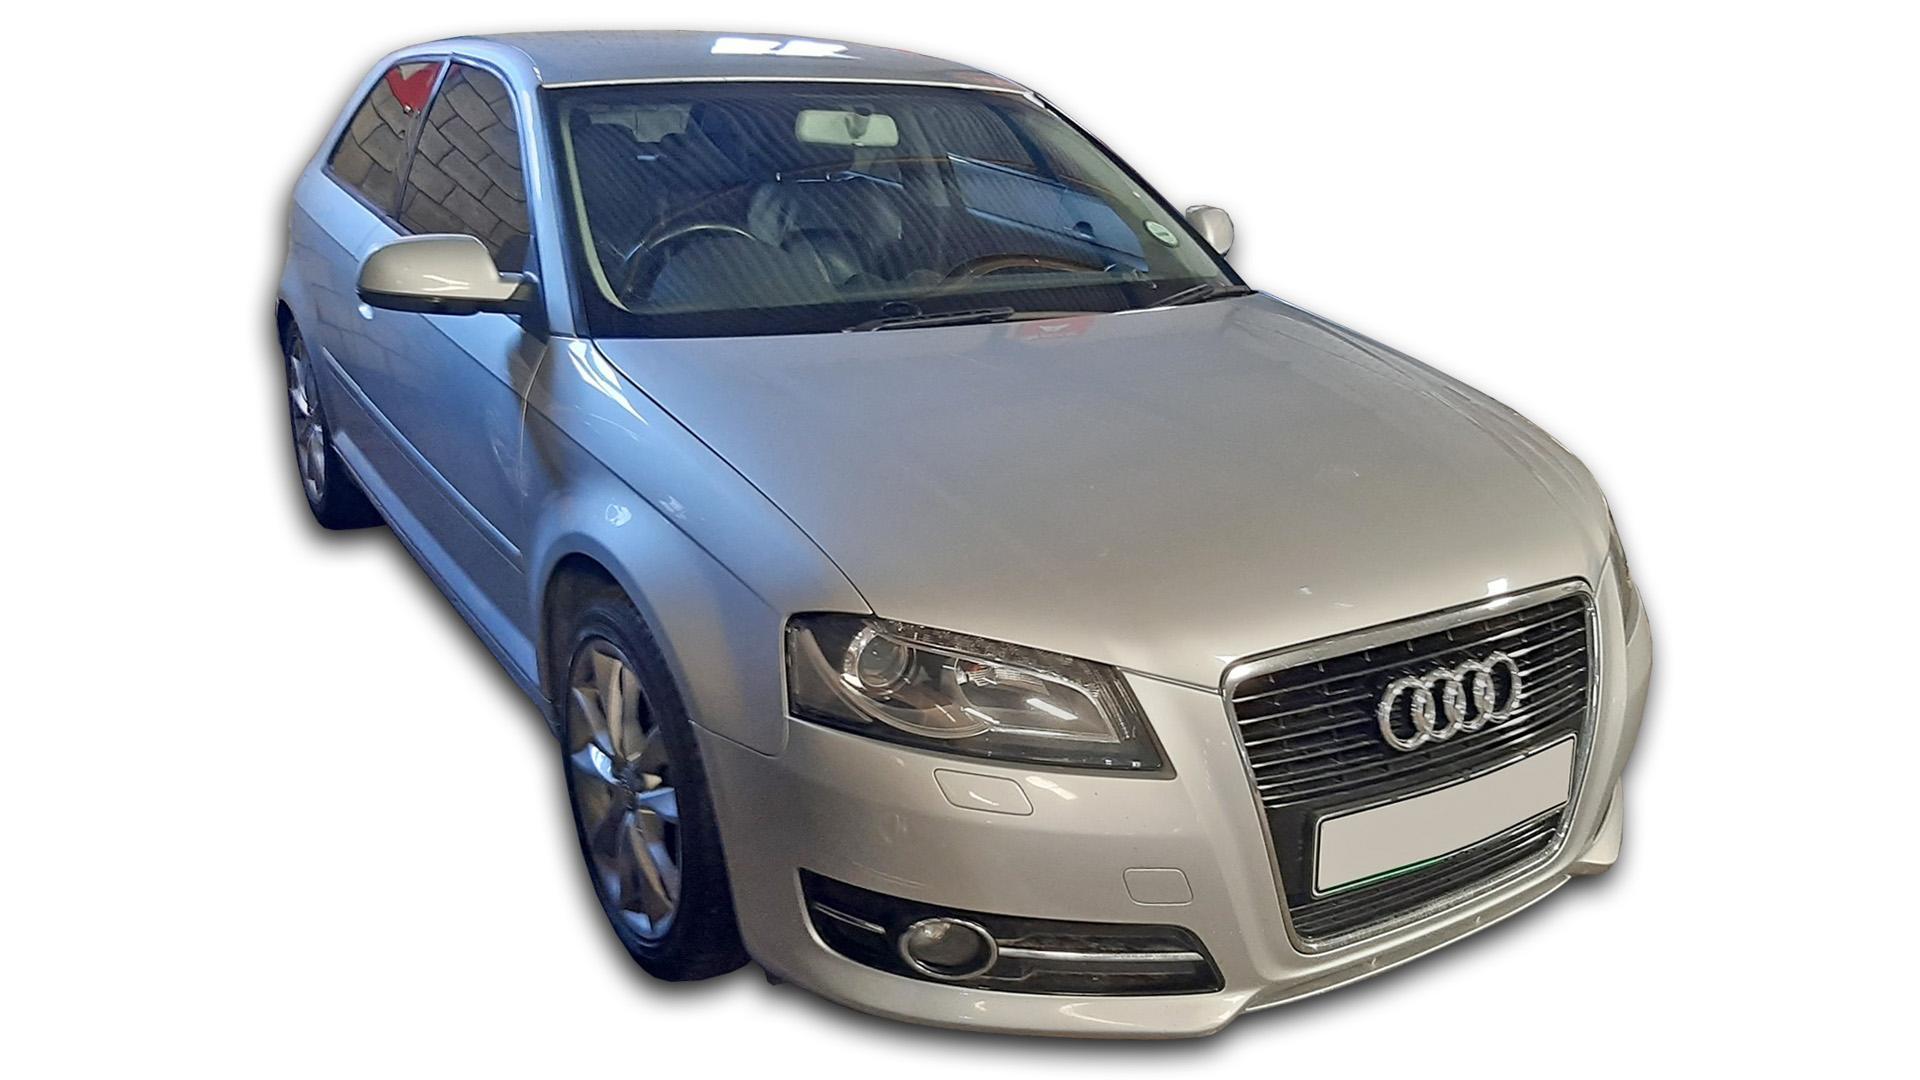 Audi A3 1.8 TFSI Ambition S TR